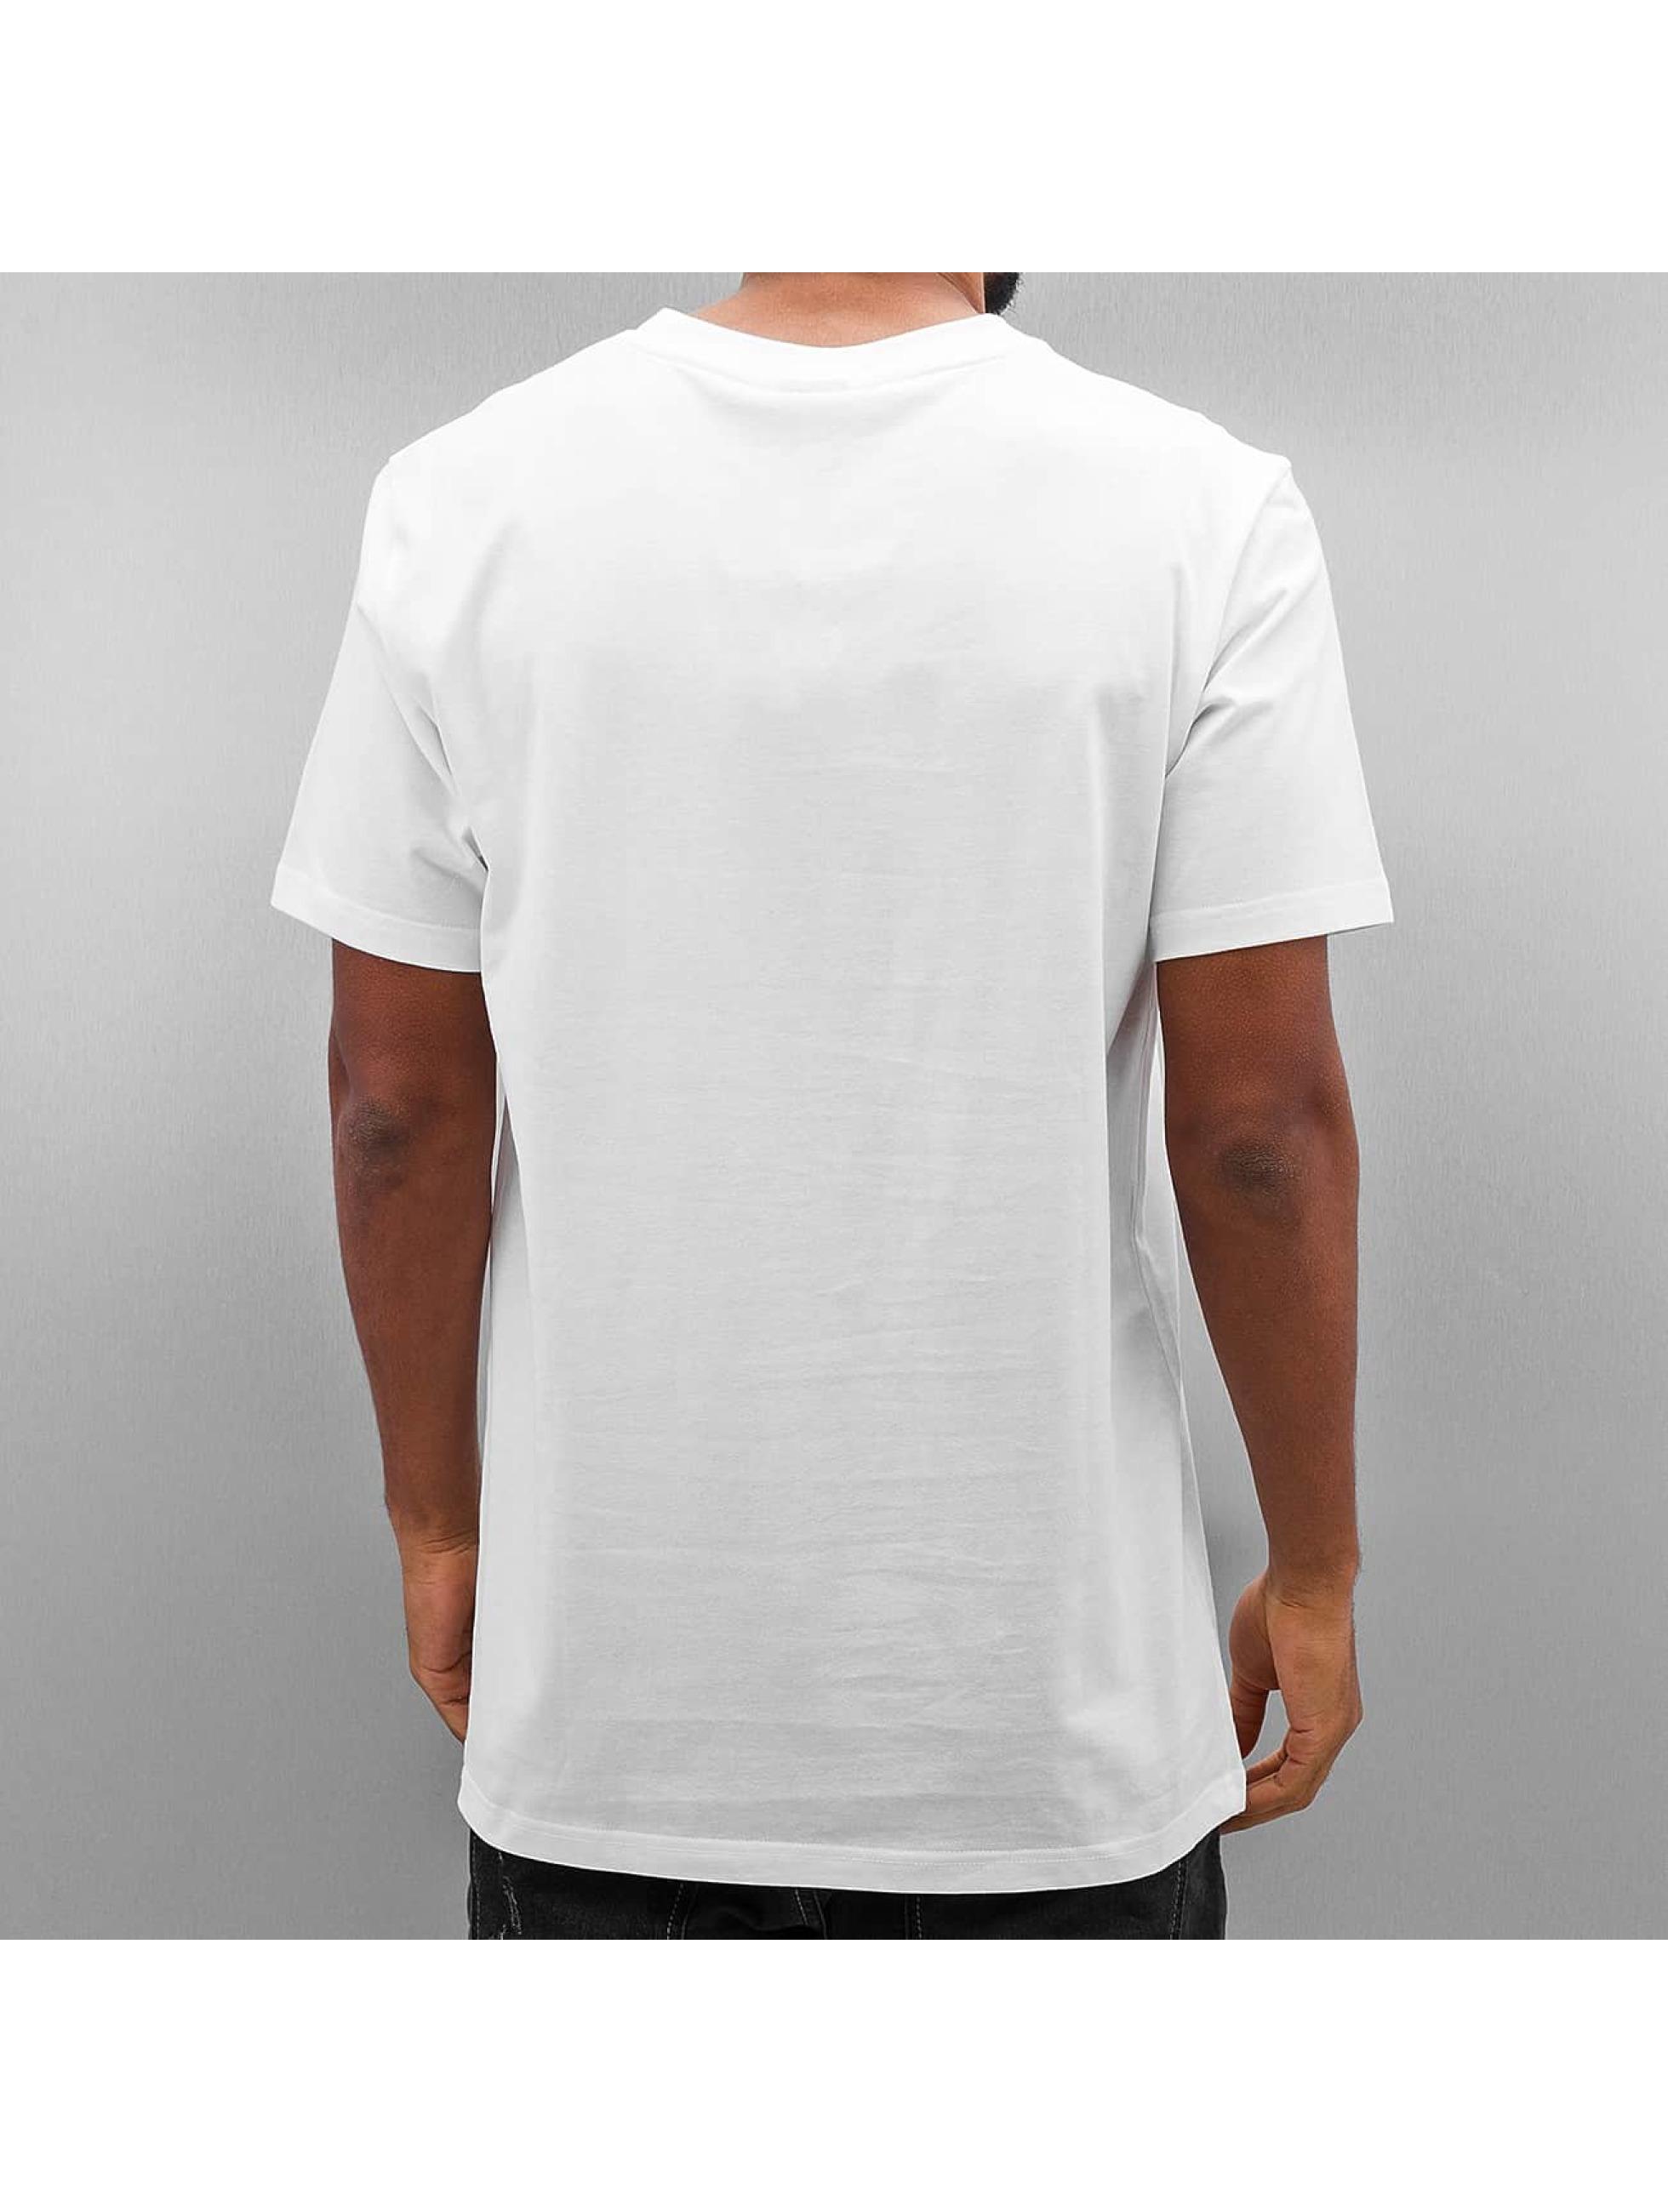 K1X T-Shirt Authentic weiß